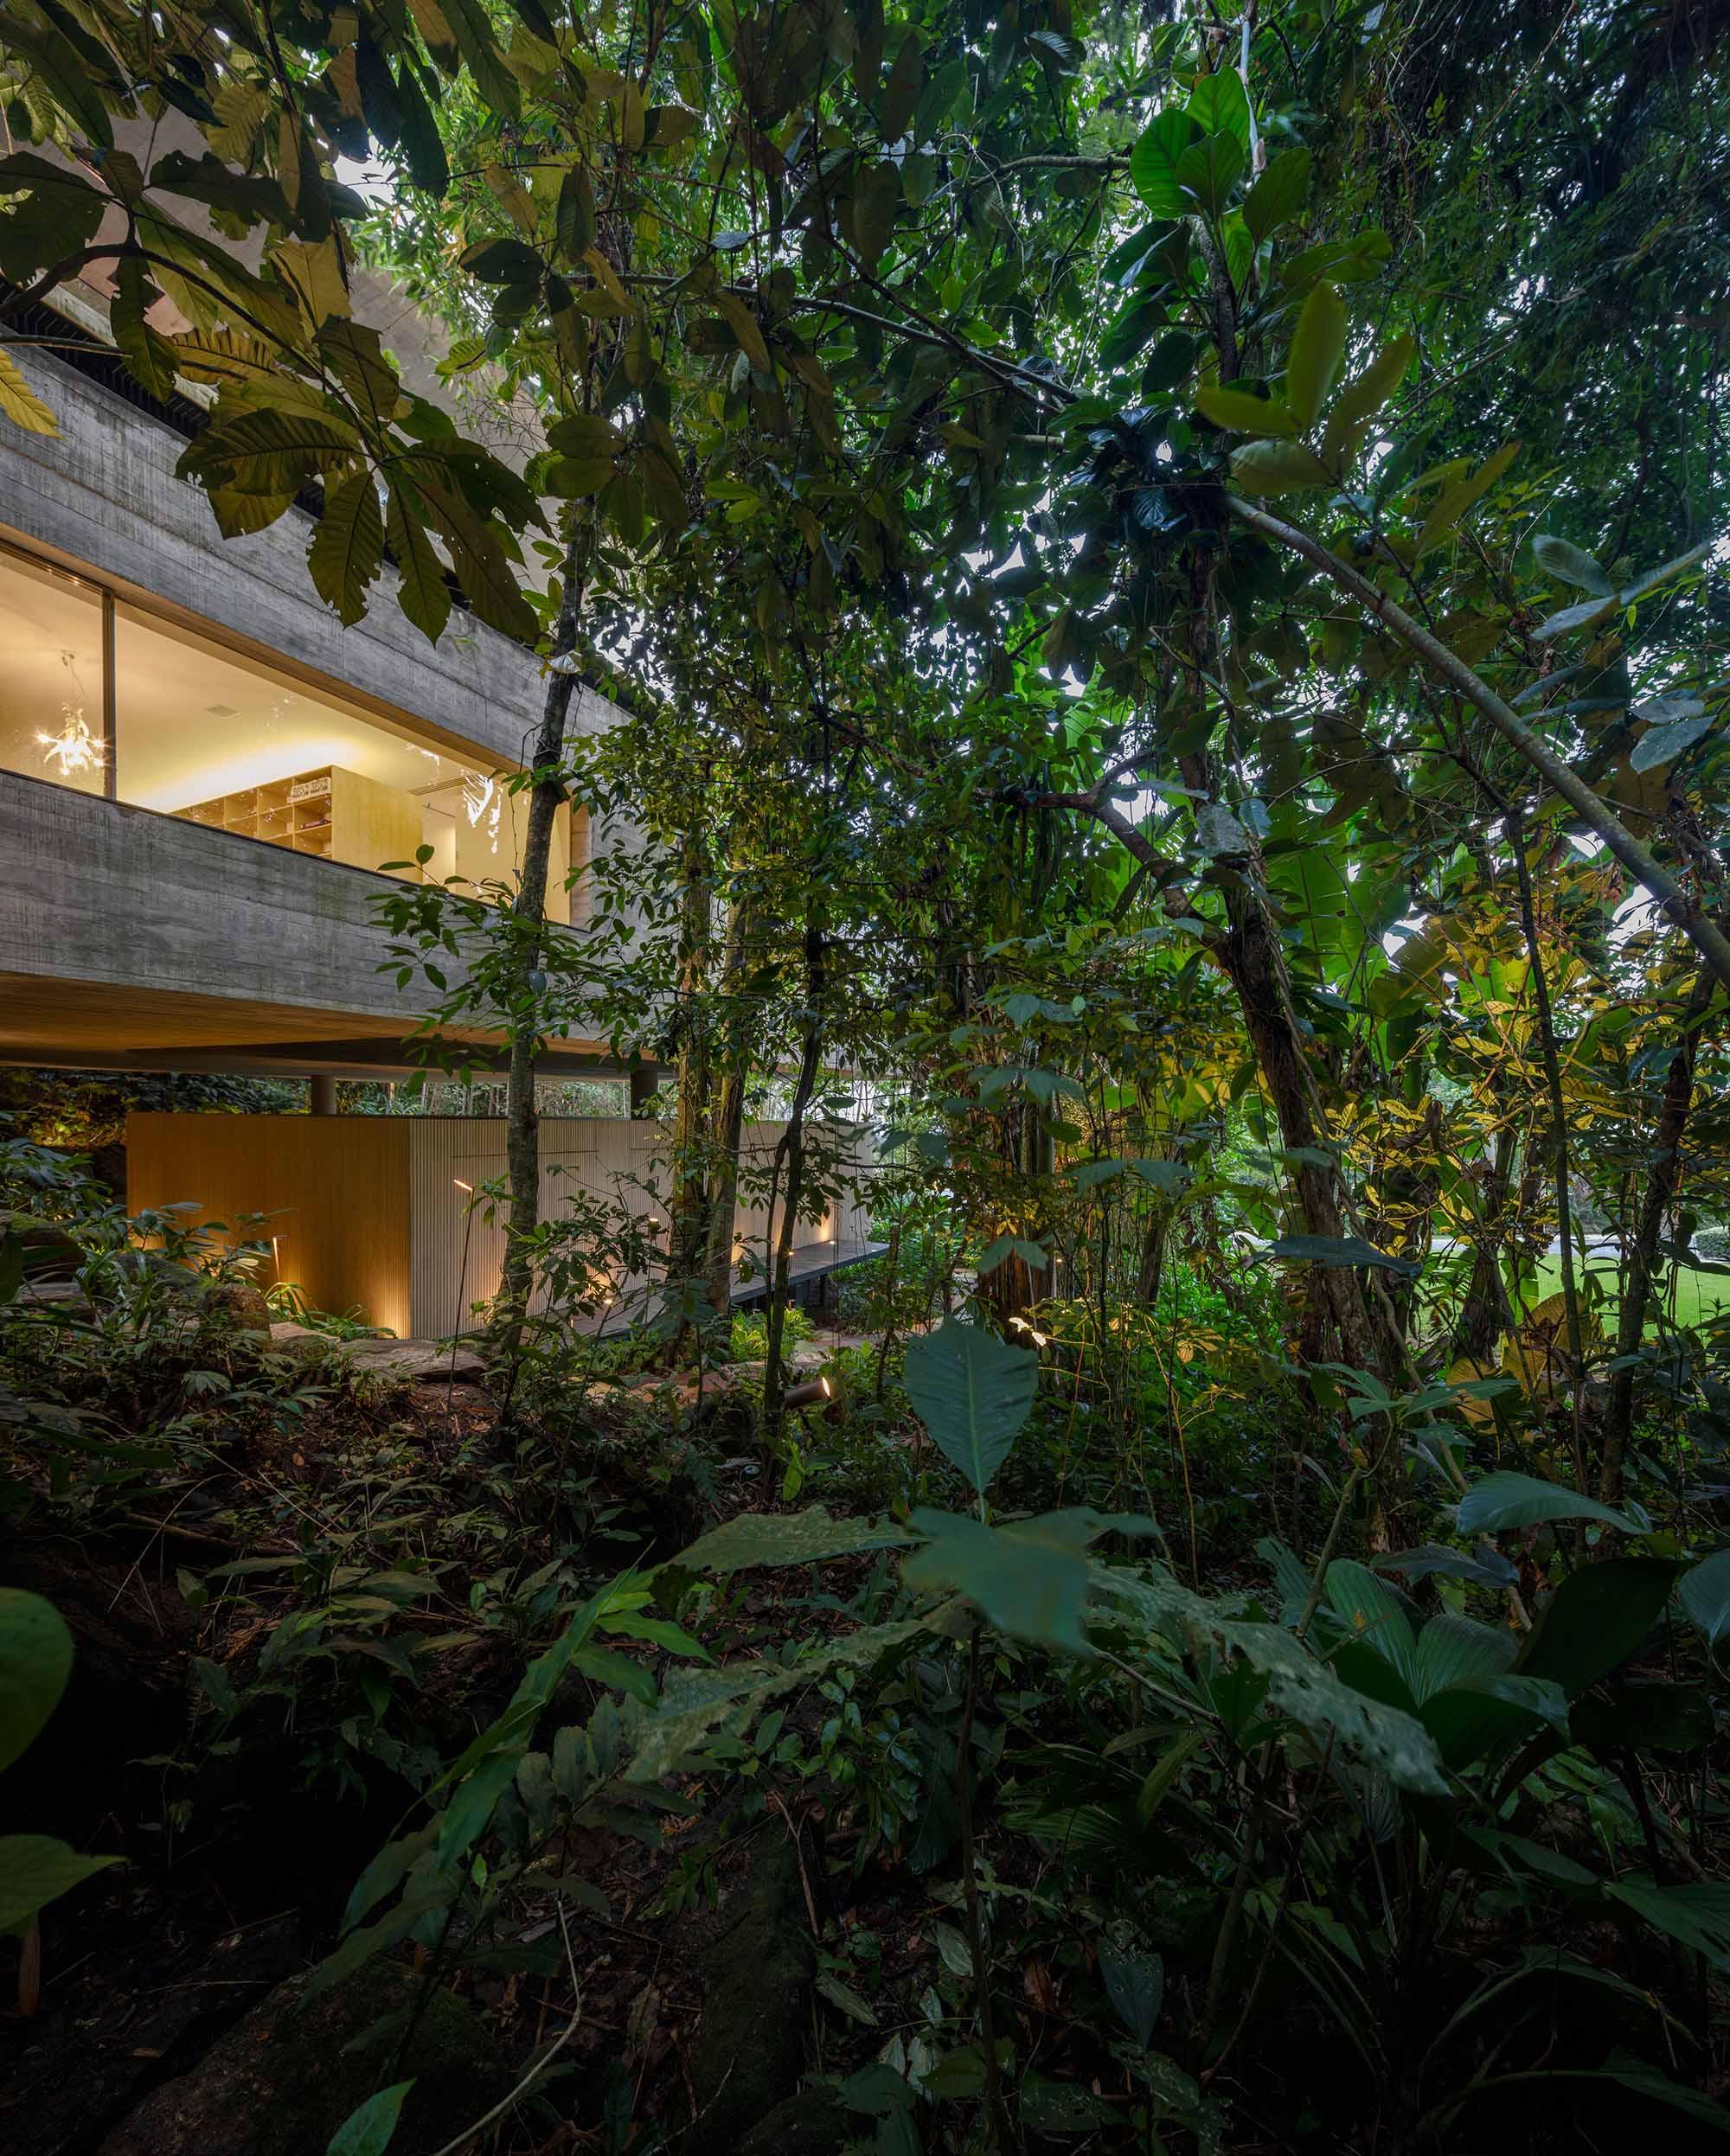 H-House-Life-Jungle-House-Casa-Da-Mata-studio-mk27-mk27_namata_fernandoguerra_medium(49).JPG